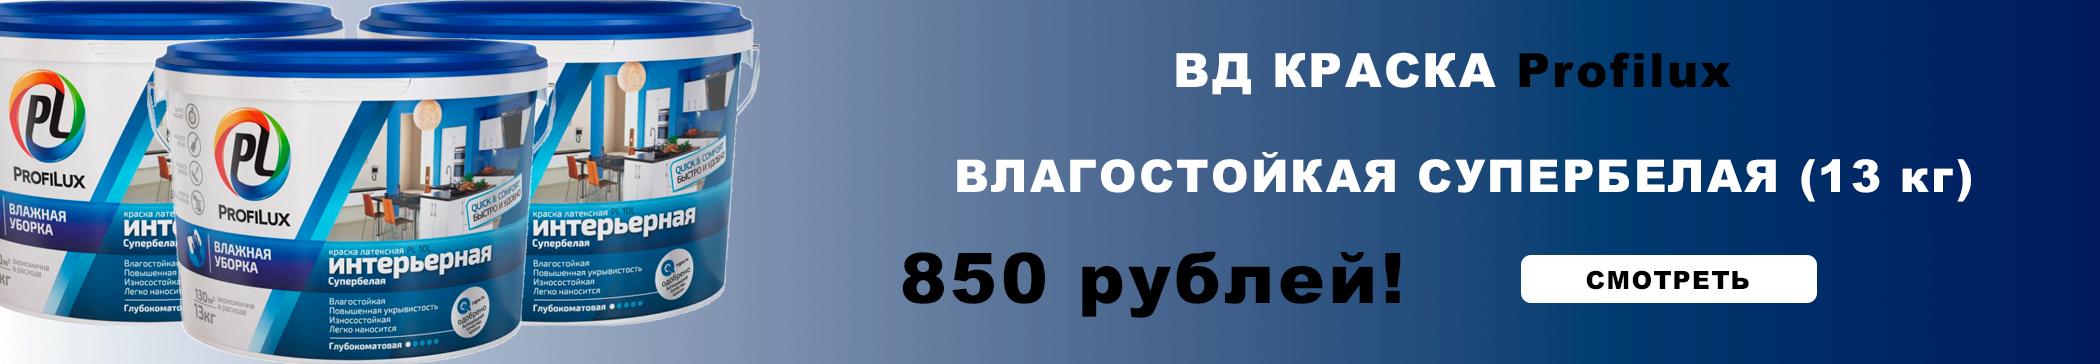 https://st-perm.ru/image/catalog/sales/sales_5.png